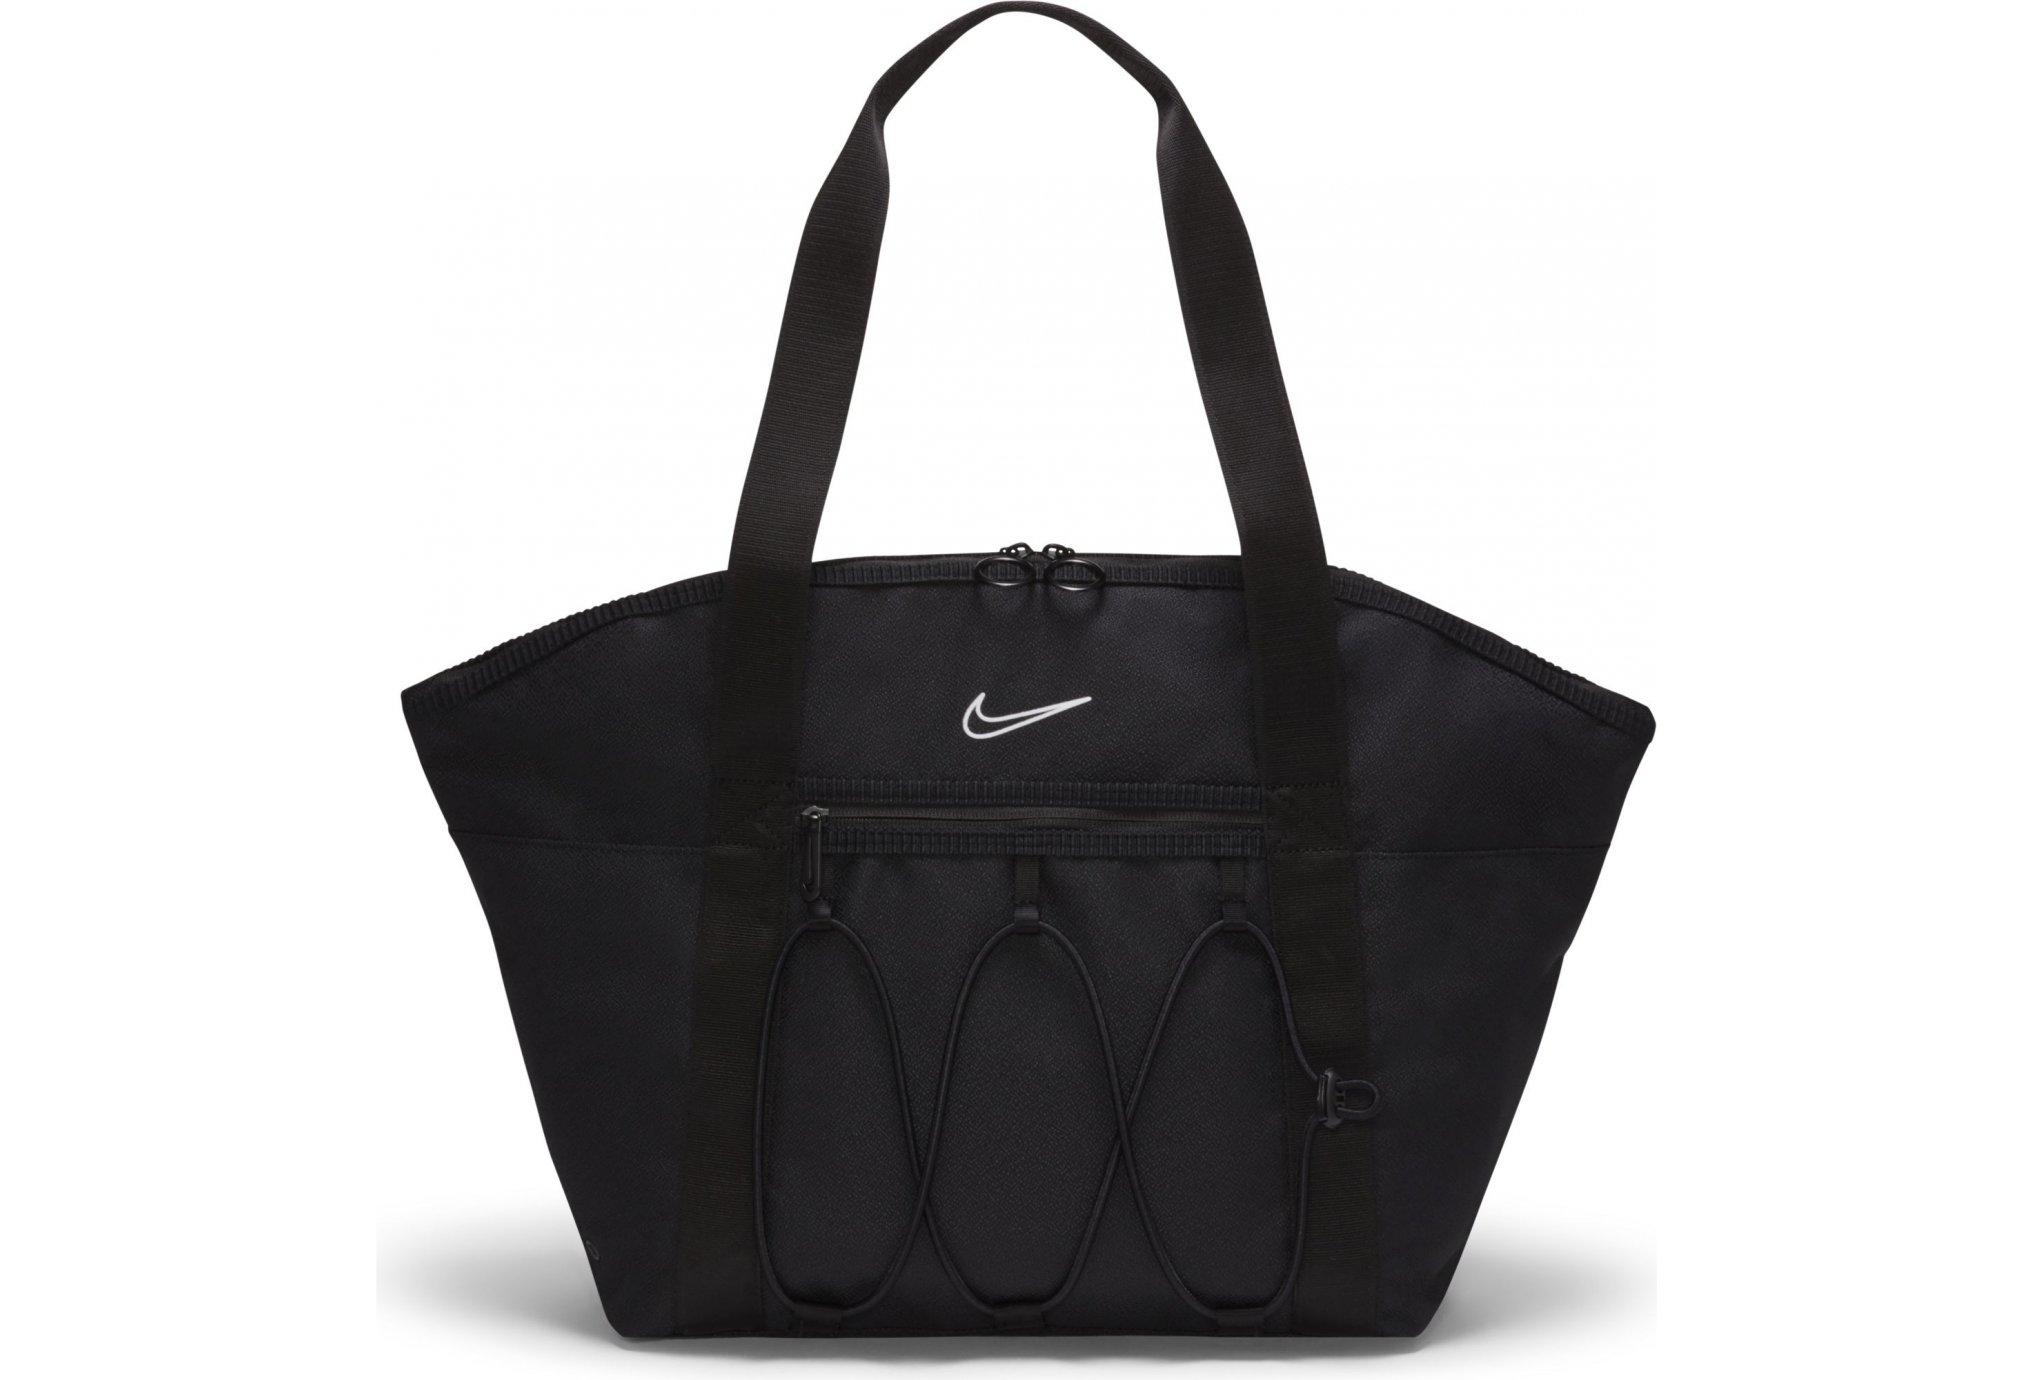 Nike One Tote W Sac de sport